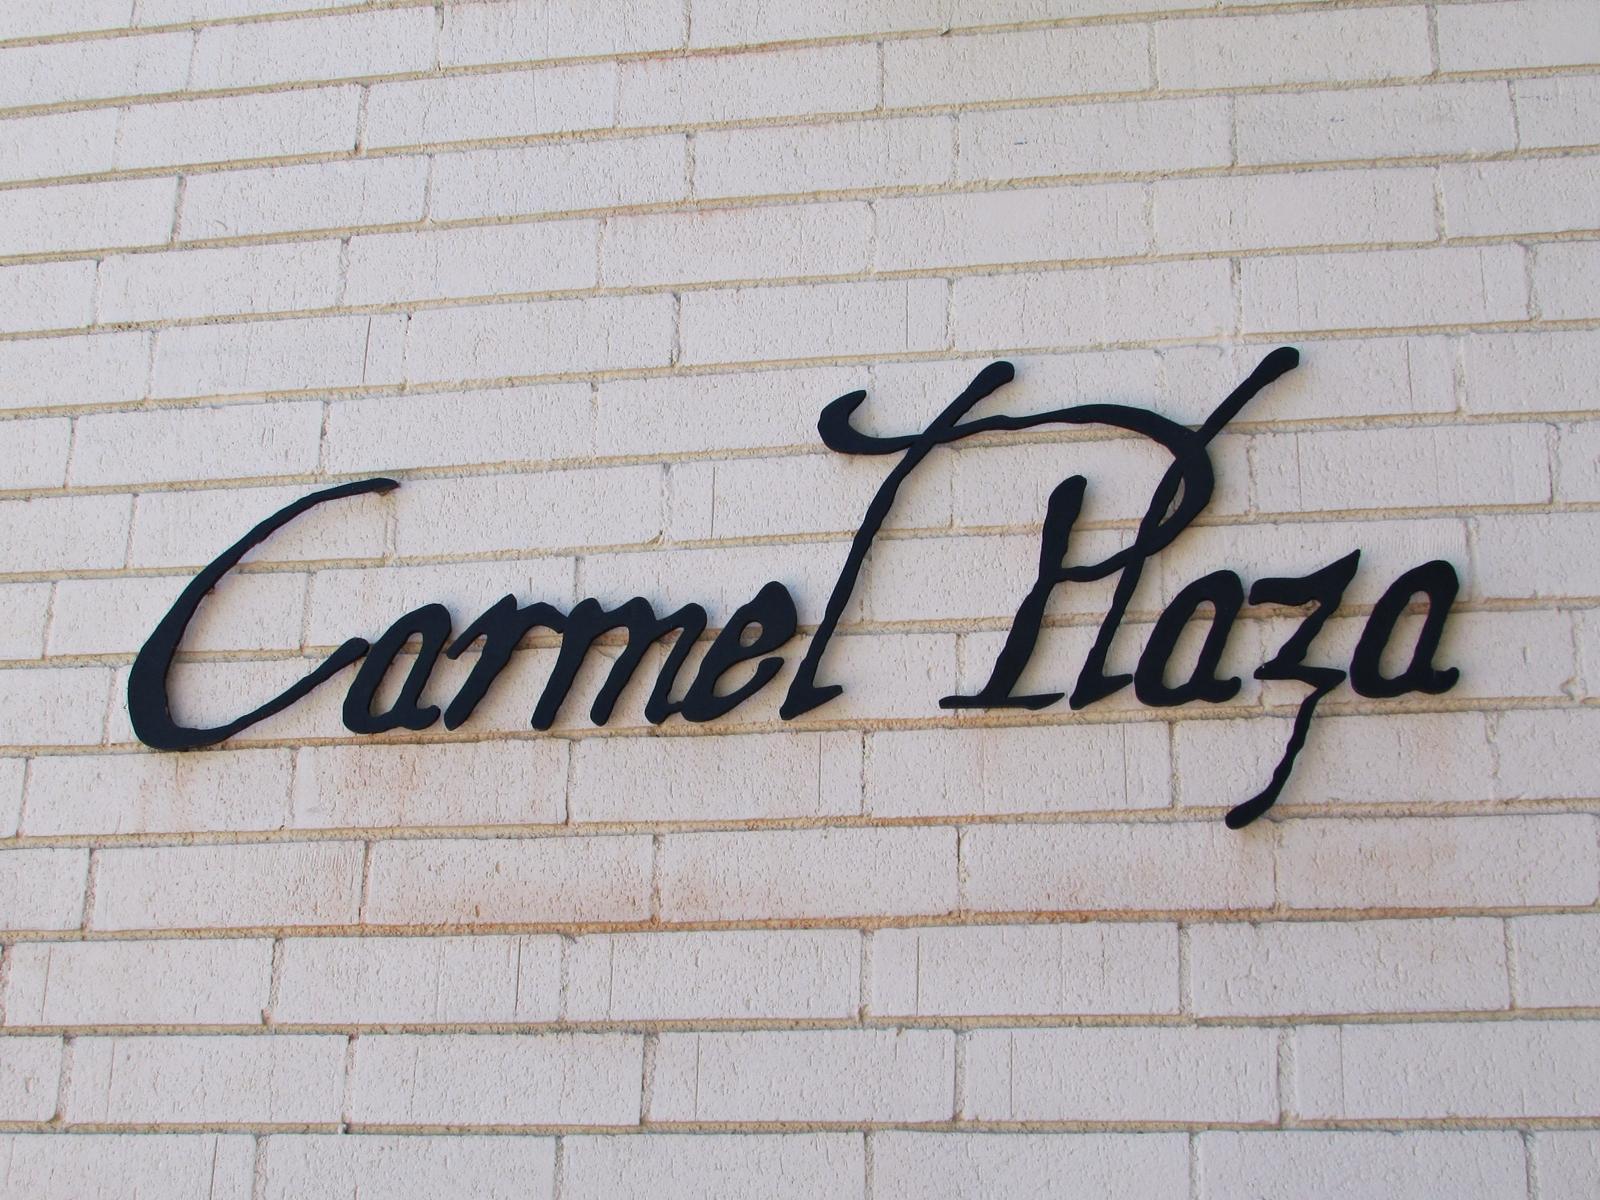 USA Rundreise - Amerika Westküste - Carmel by the Sea - Fashionladyloves - Travelblog - Reise Blog